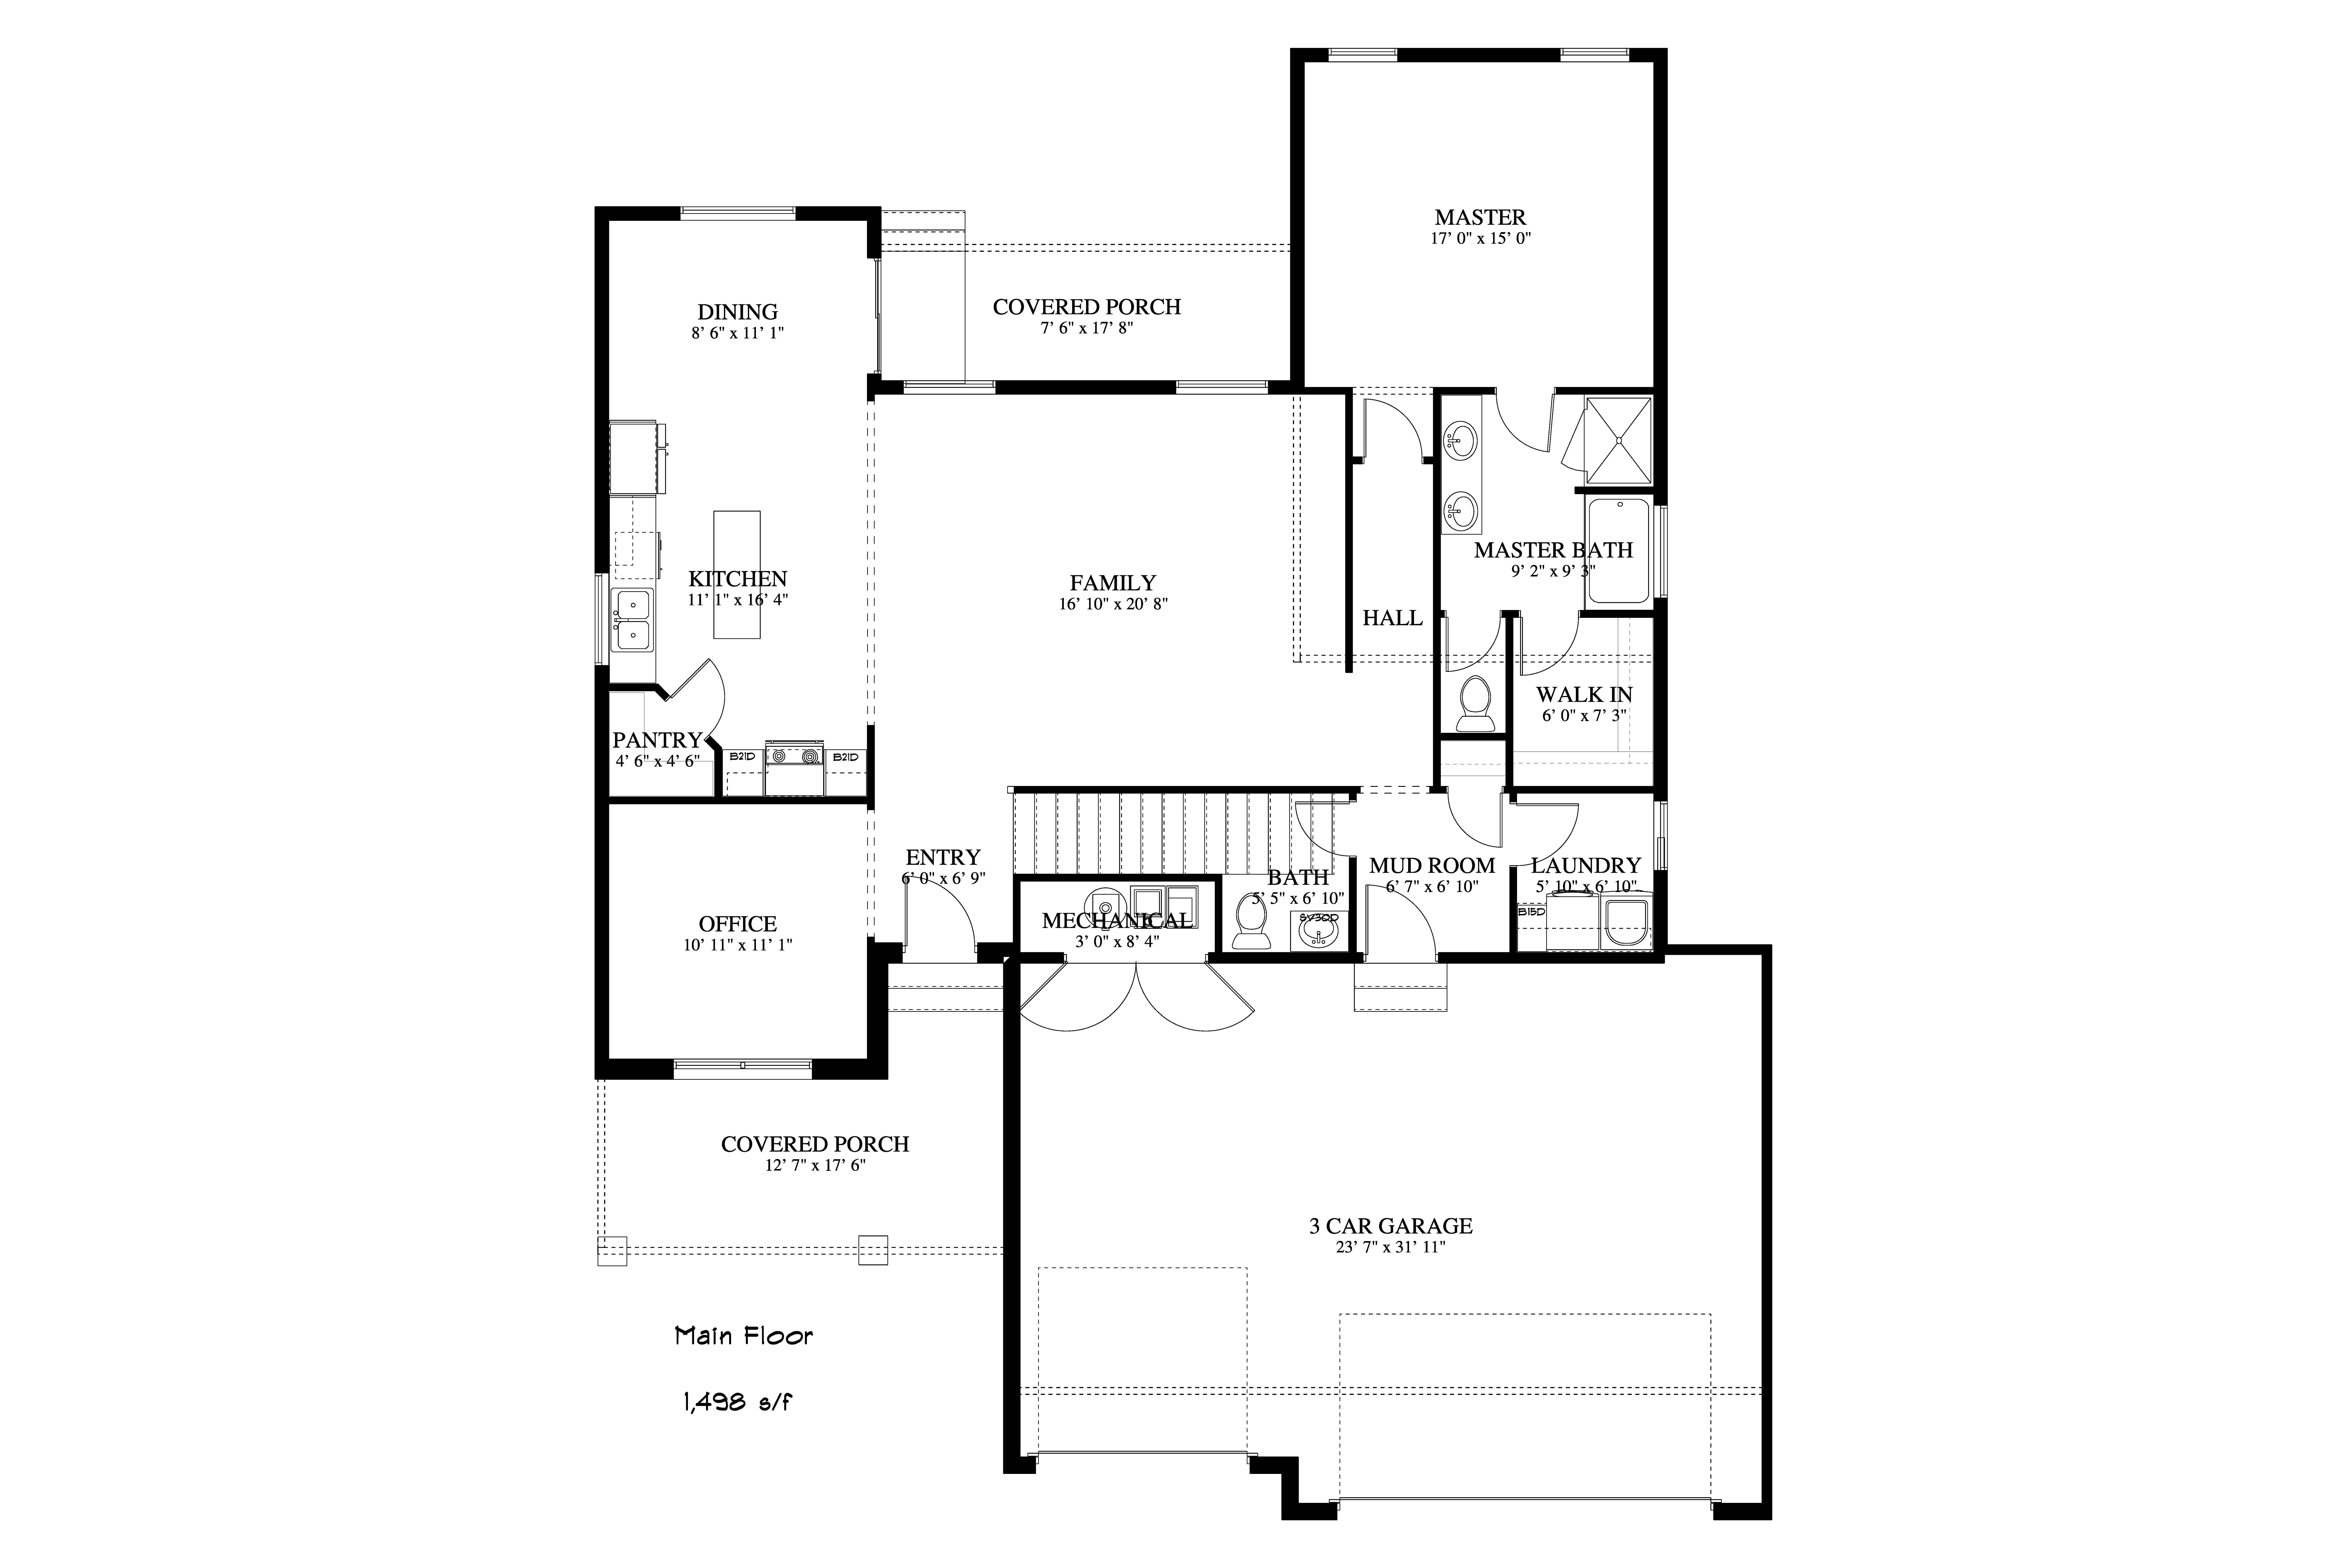 Craftsman Style House Plan - 4 Beds 2.5 Baths 2399 Sq/Ft Plan #1060-52 Floor Plan - Main Floor